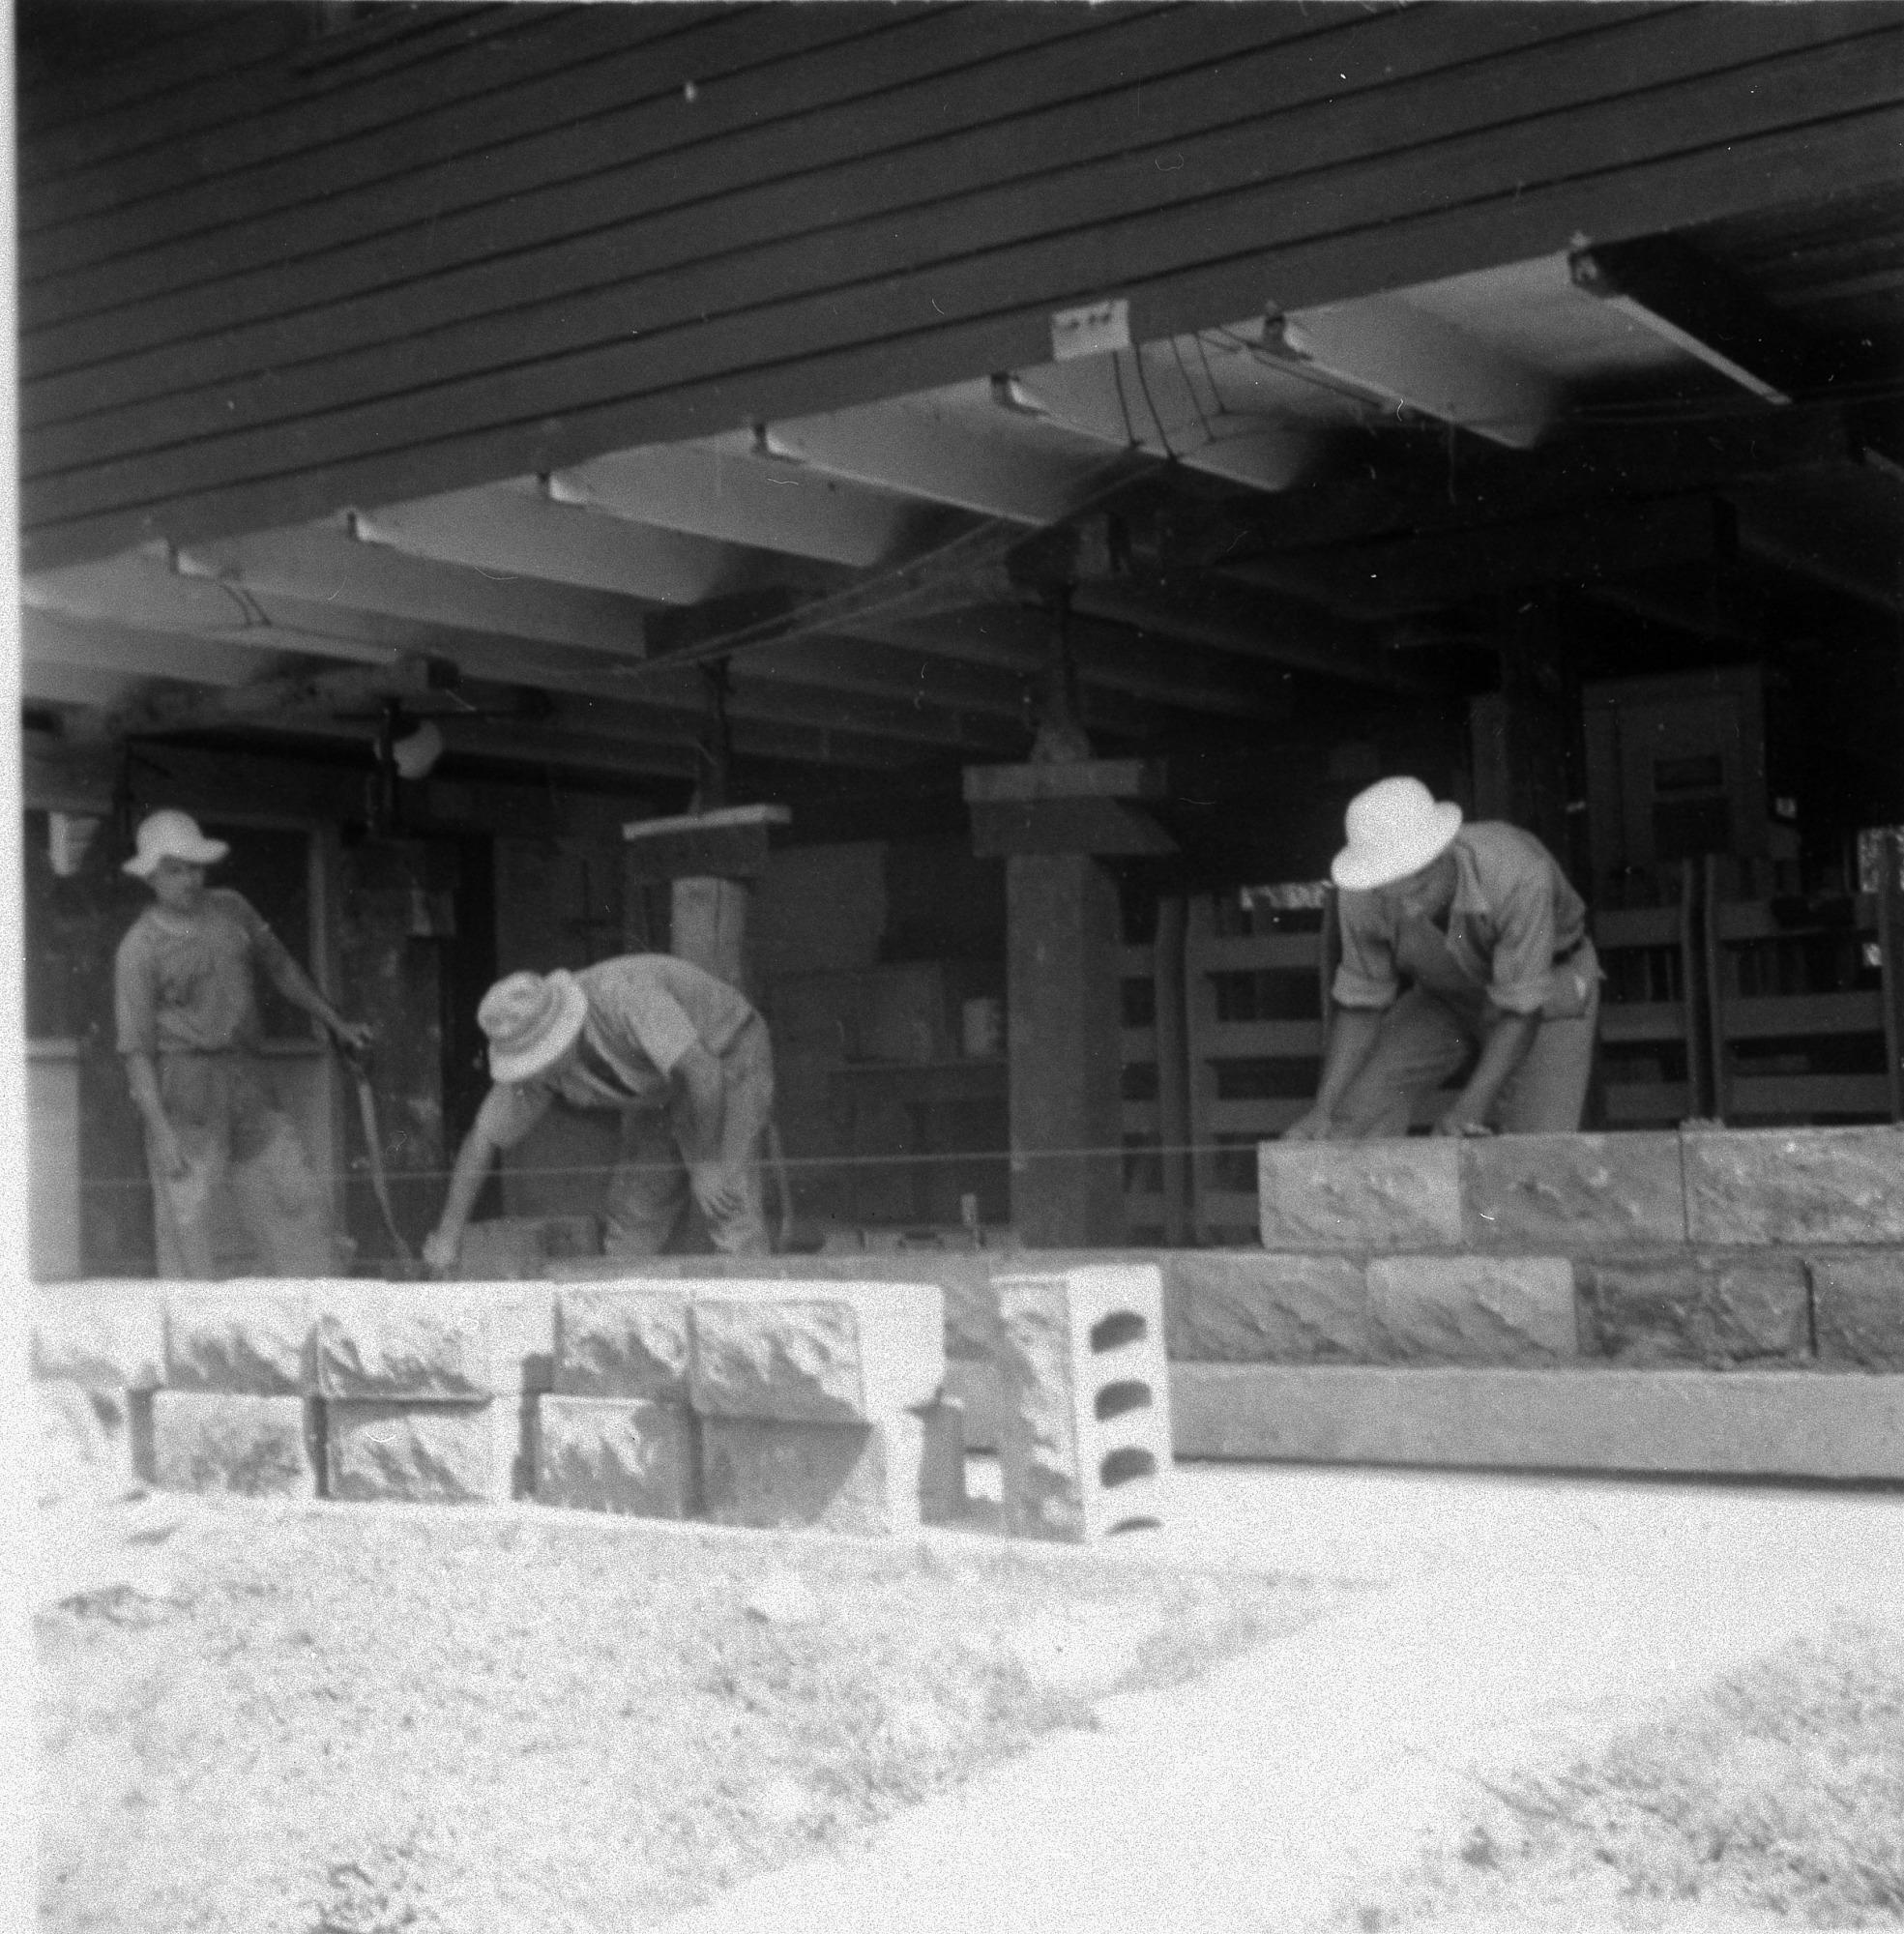 Construction work on Barro Colorado Island